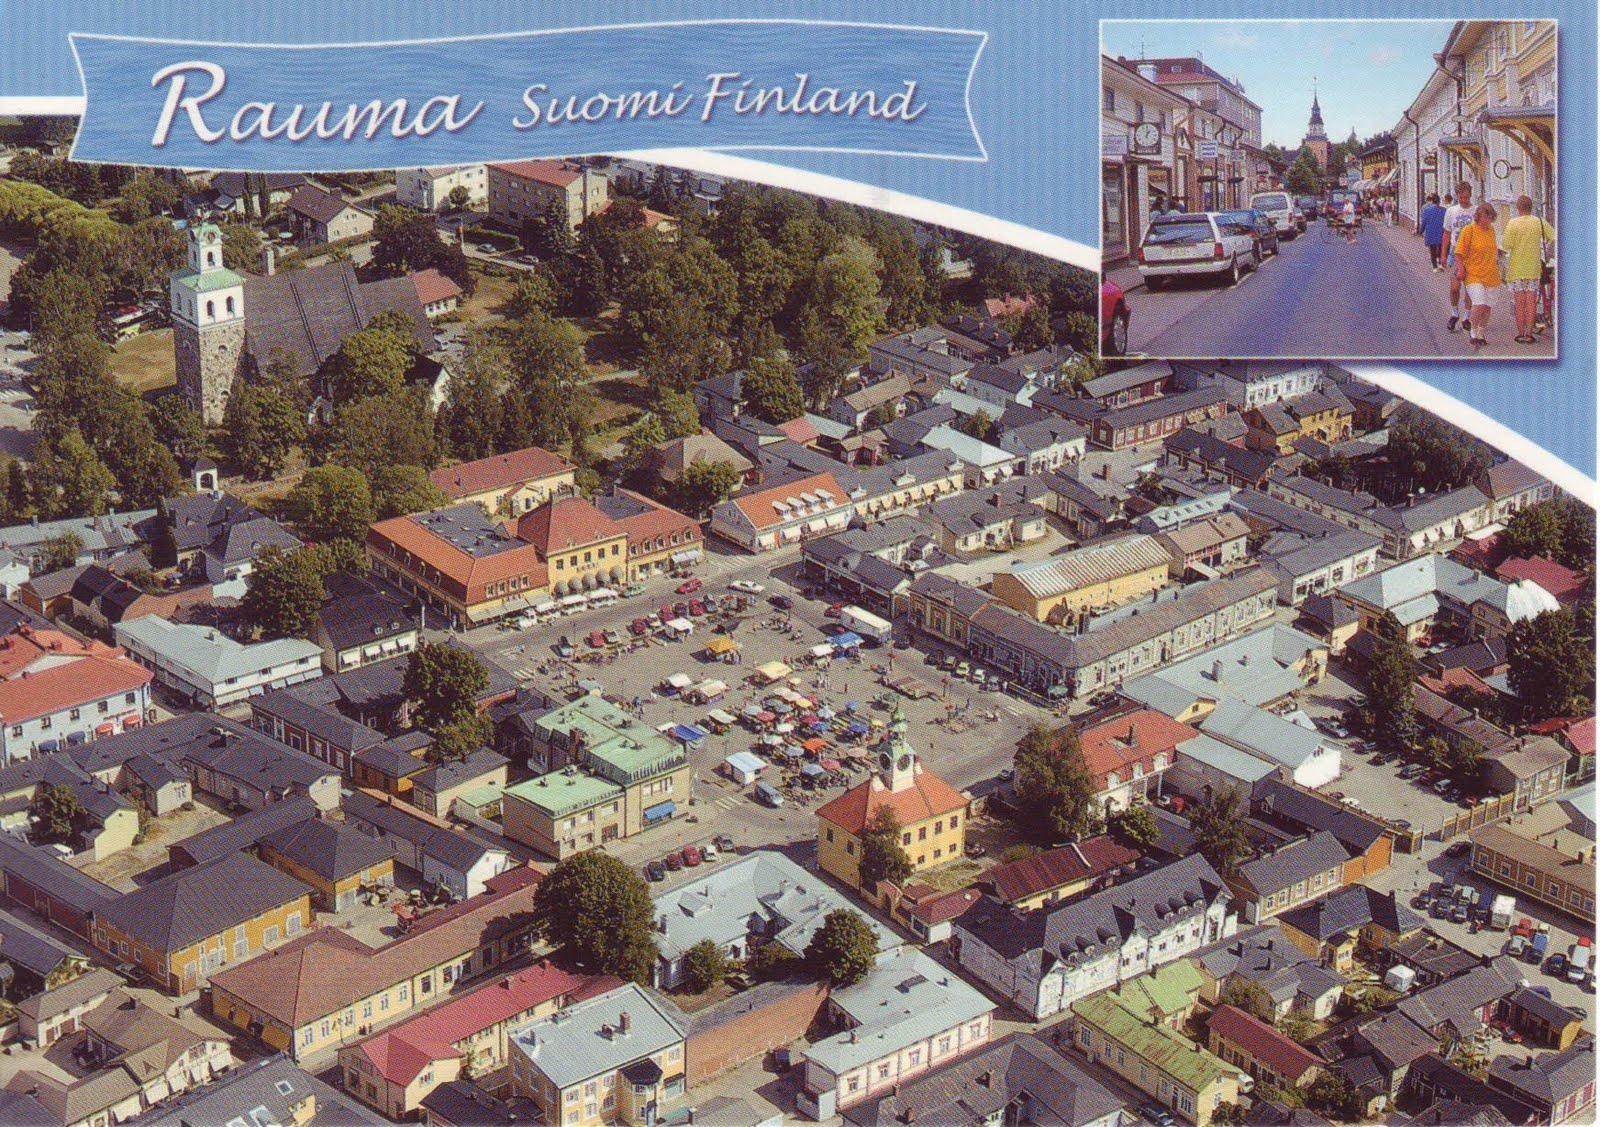 The World in Postcards - Sabine's Blog: 18/07/10 - 25/07/10